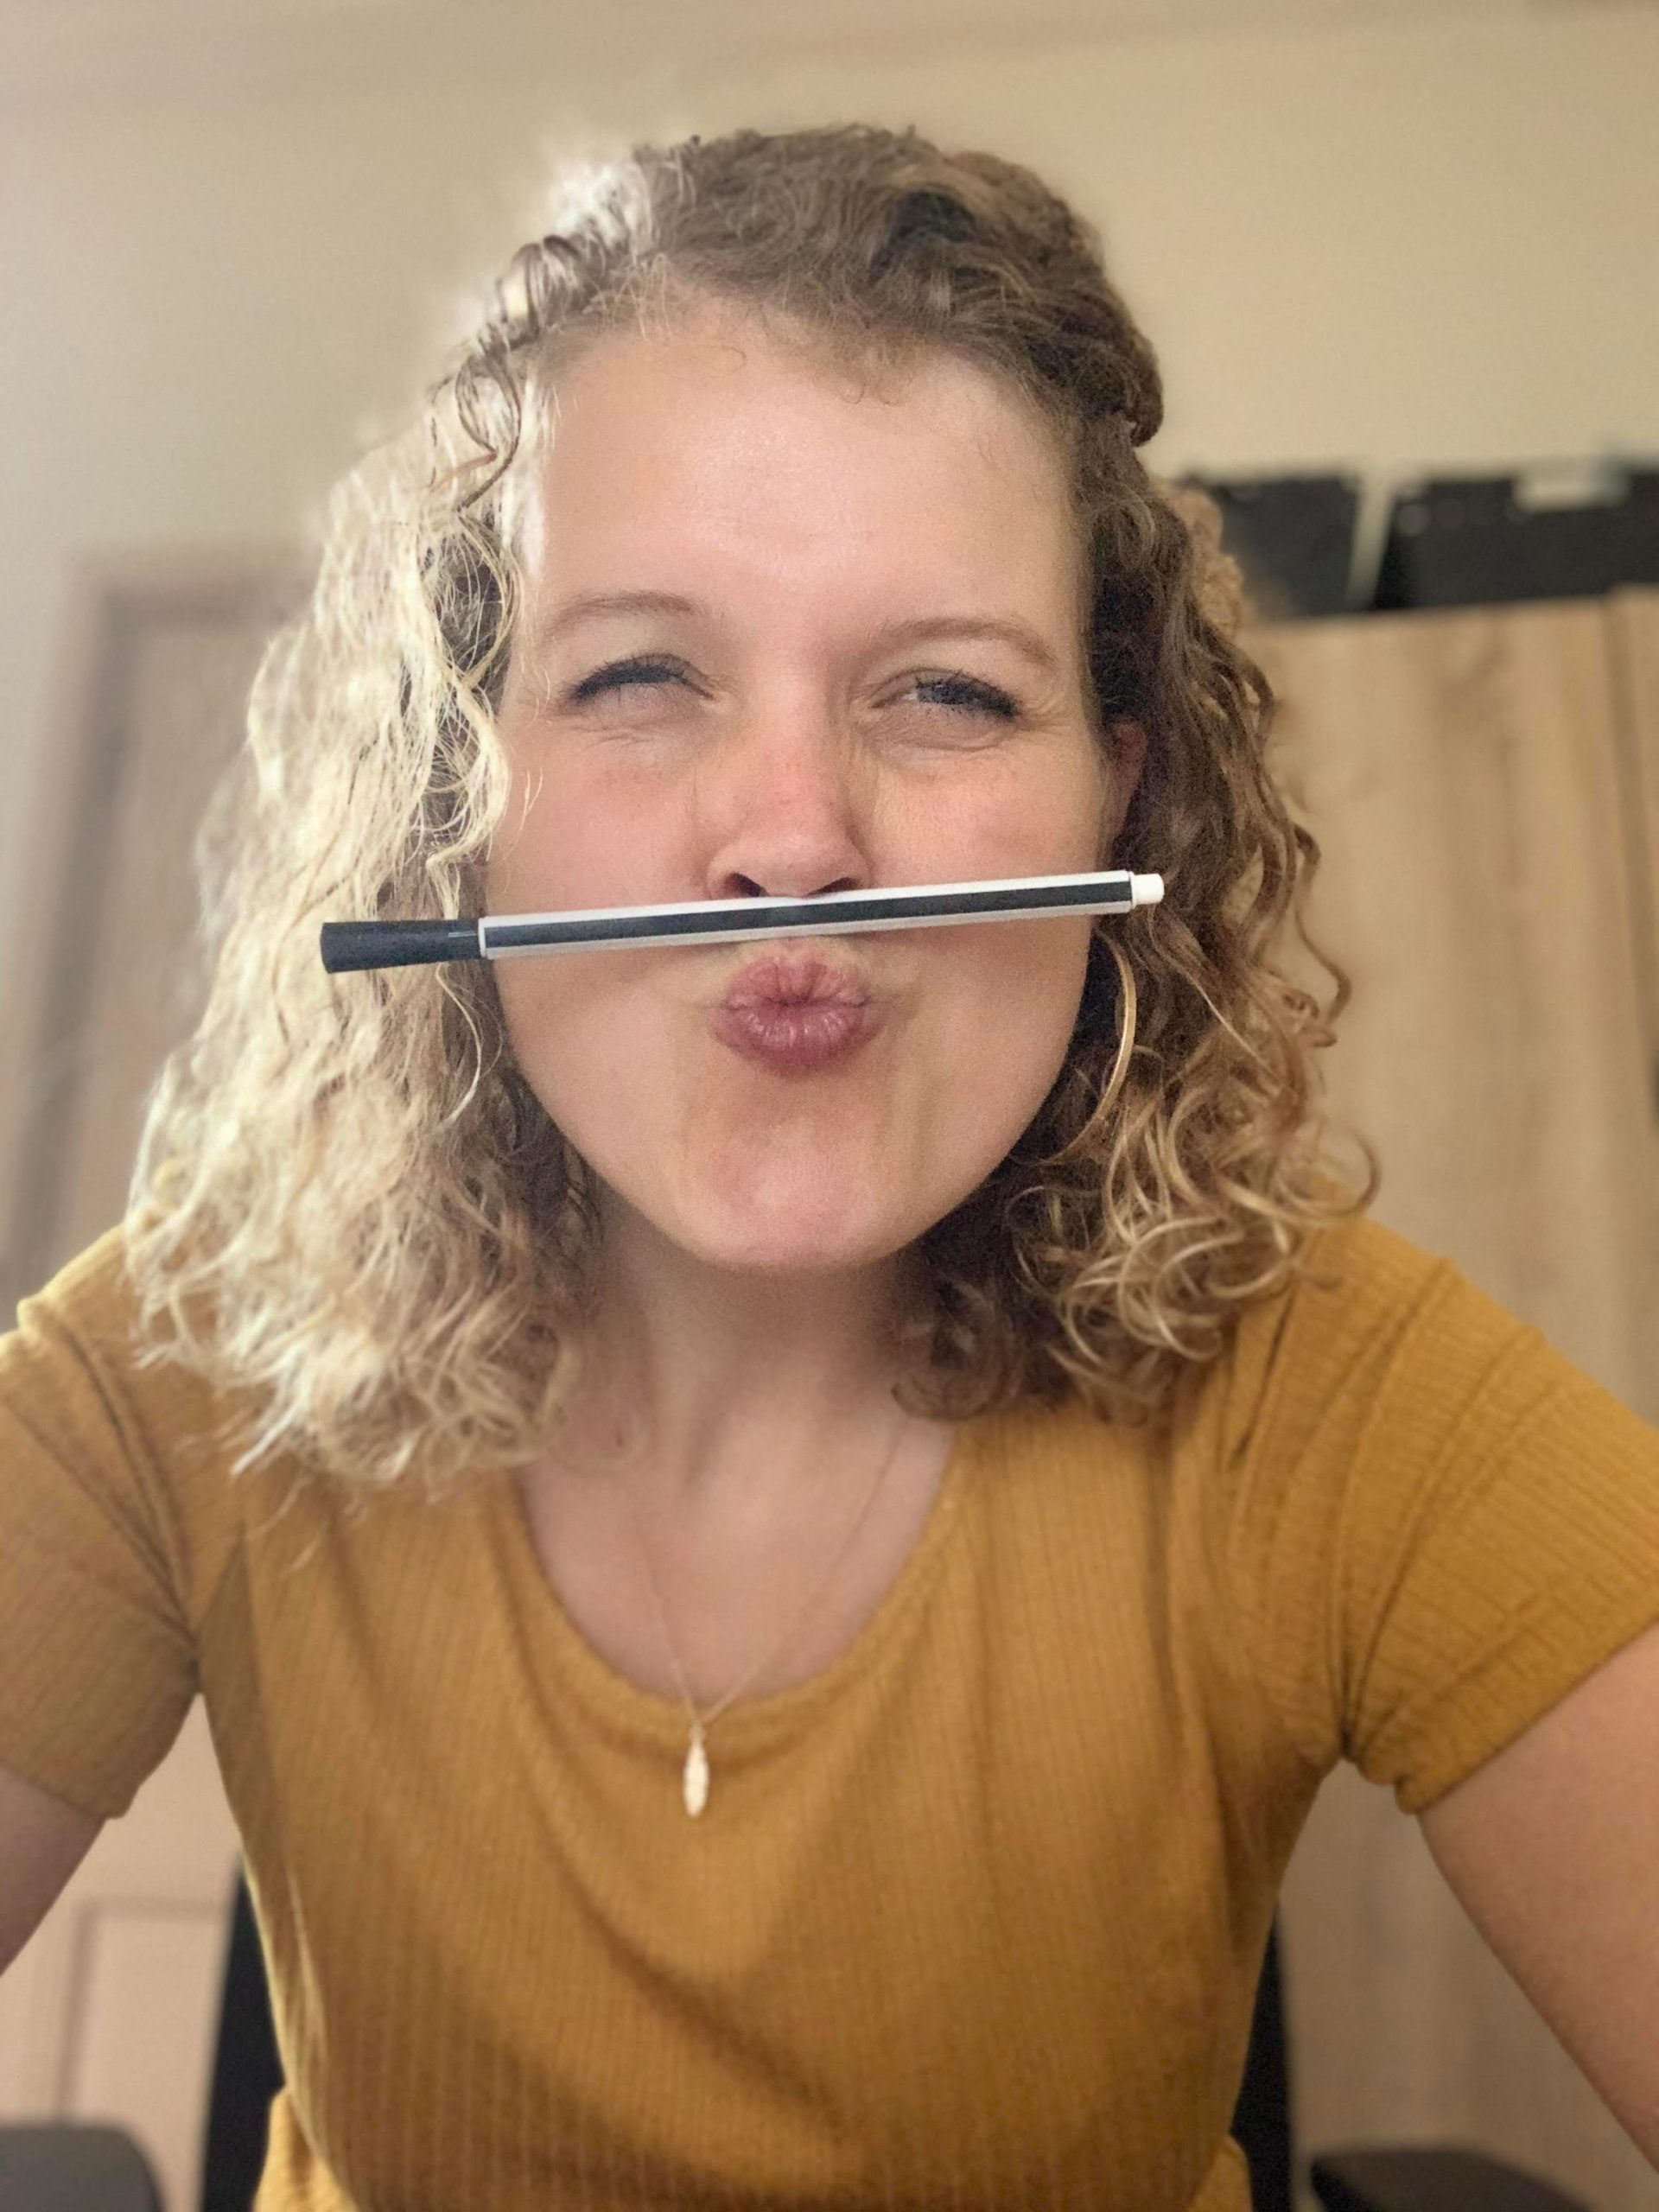 Yvonne Doff - Meet the dork - Paperdork klanten